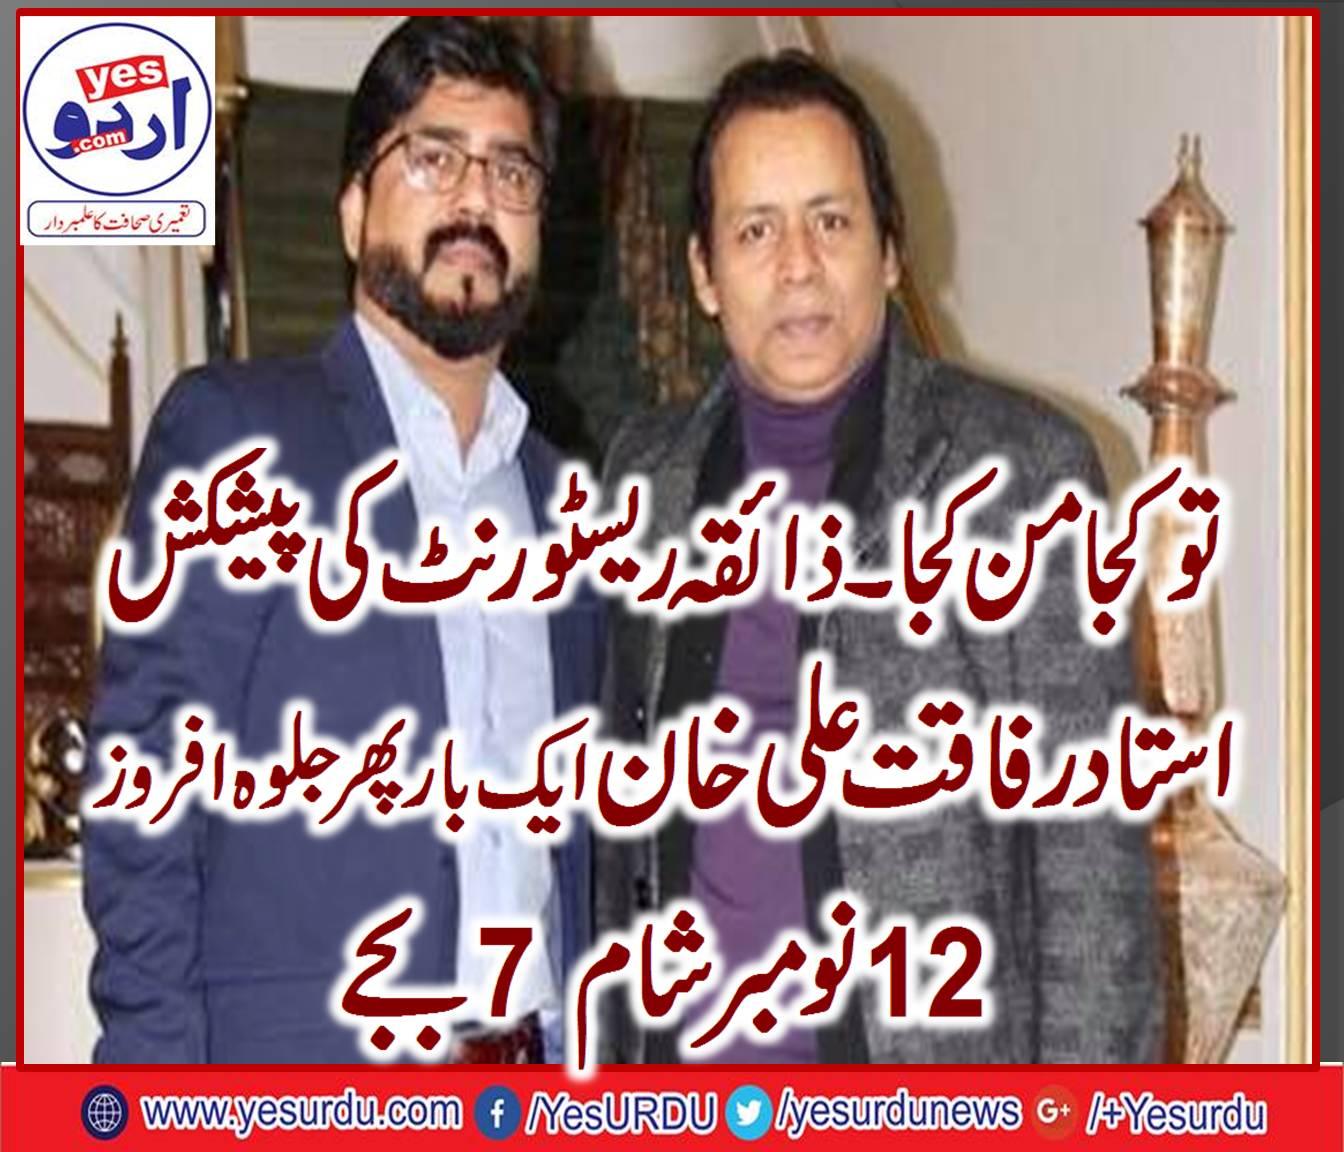 Ustad Rafaqat Ali Khan, with Imran Younas, Organizer, Musical Night, at Zaiqa Restaurant